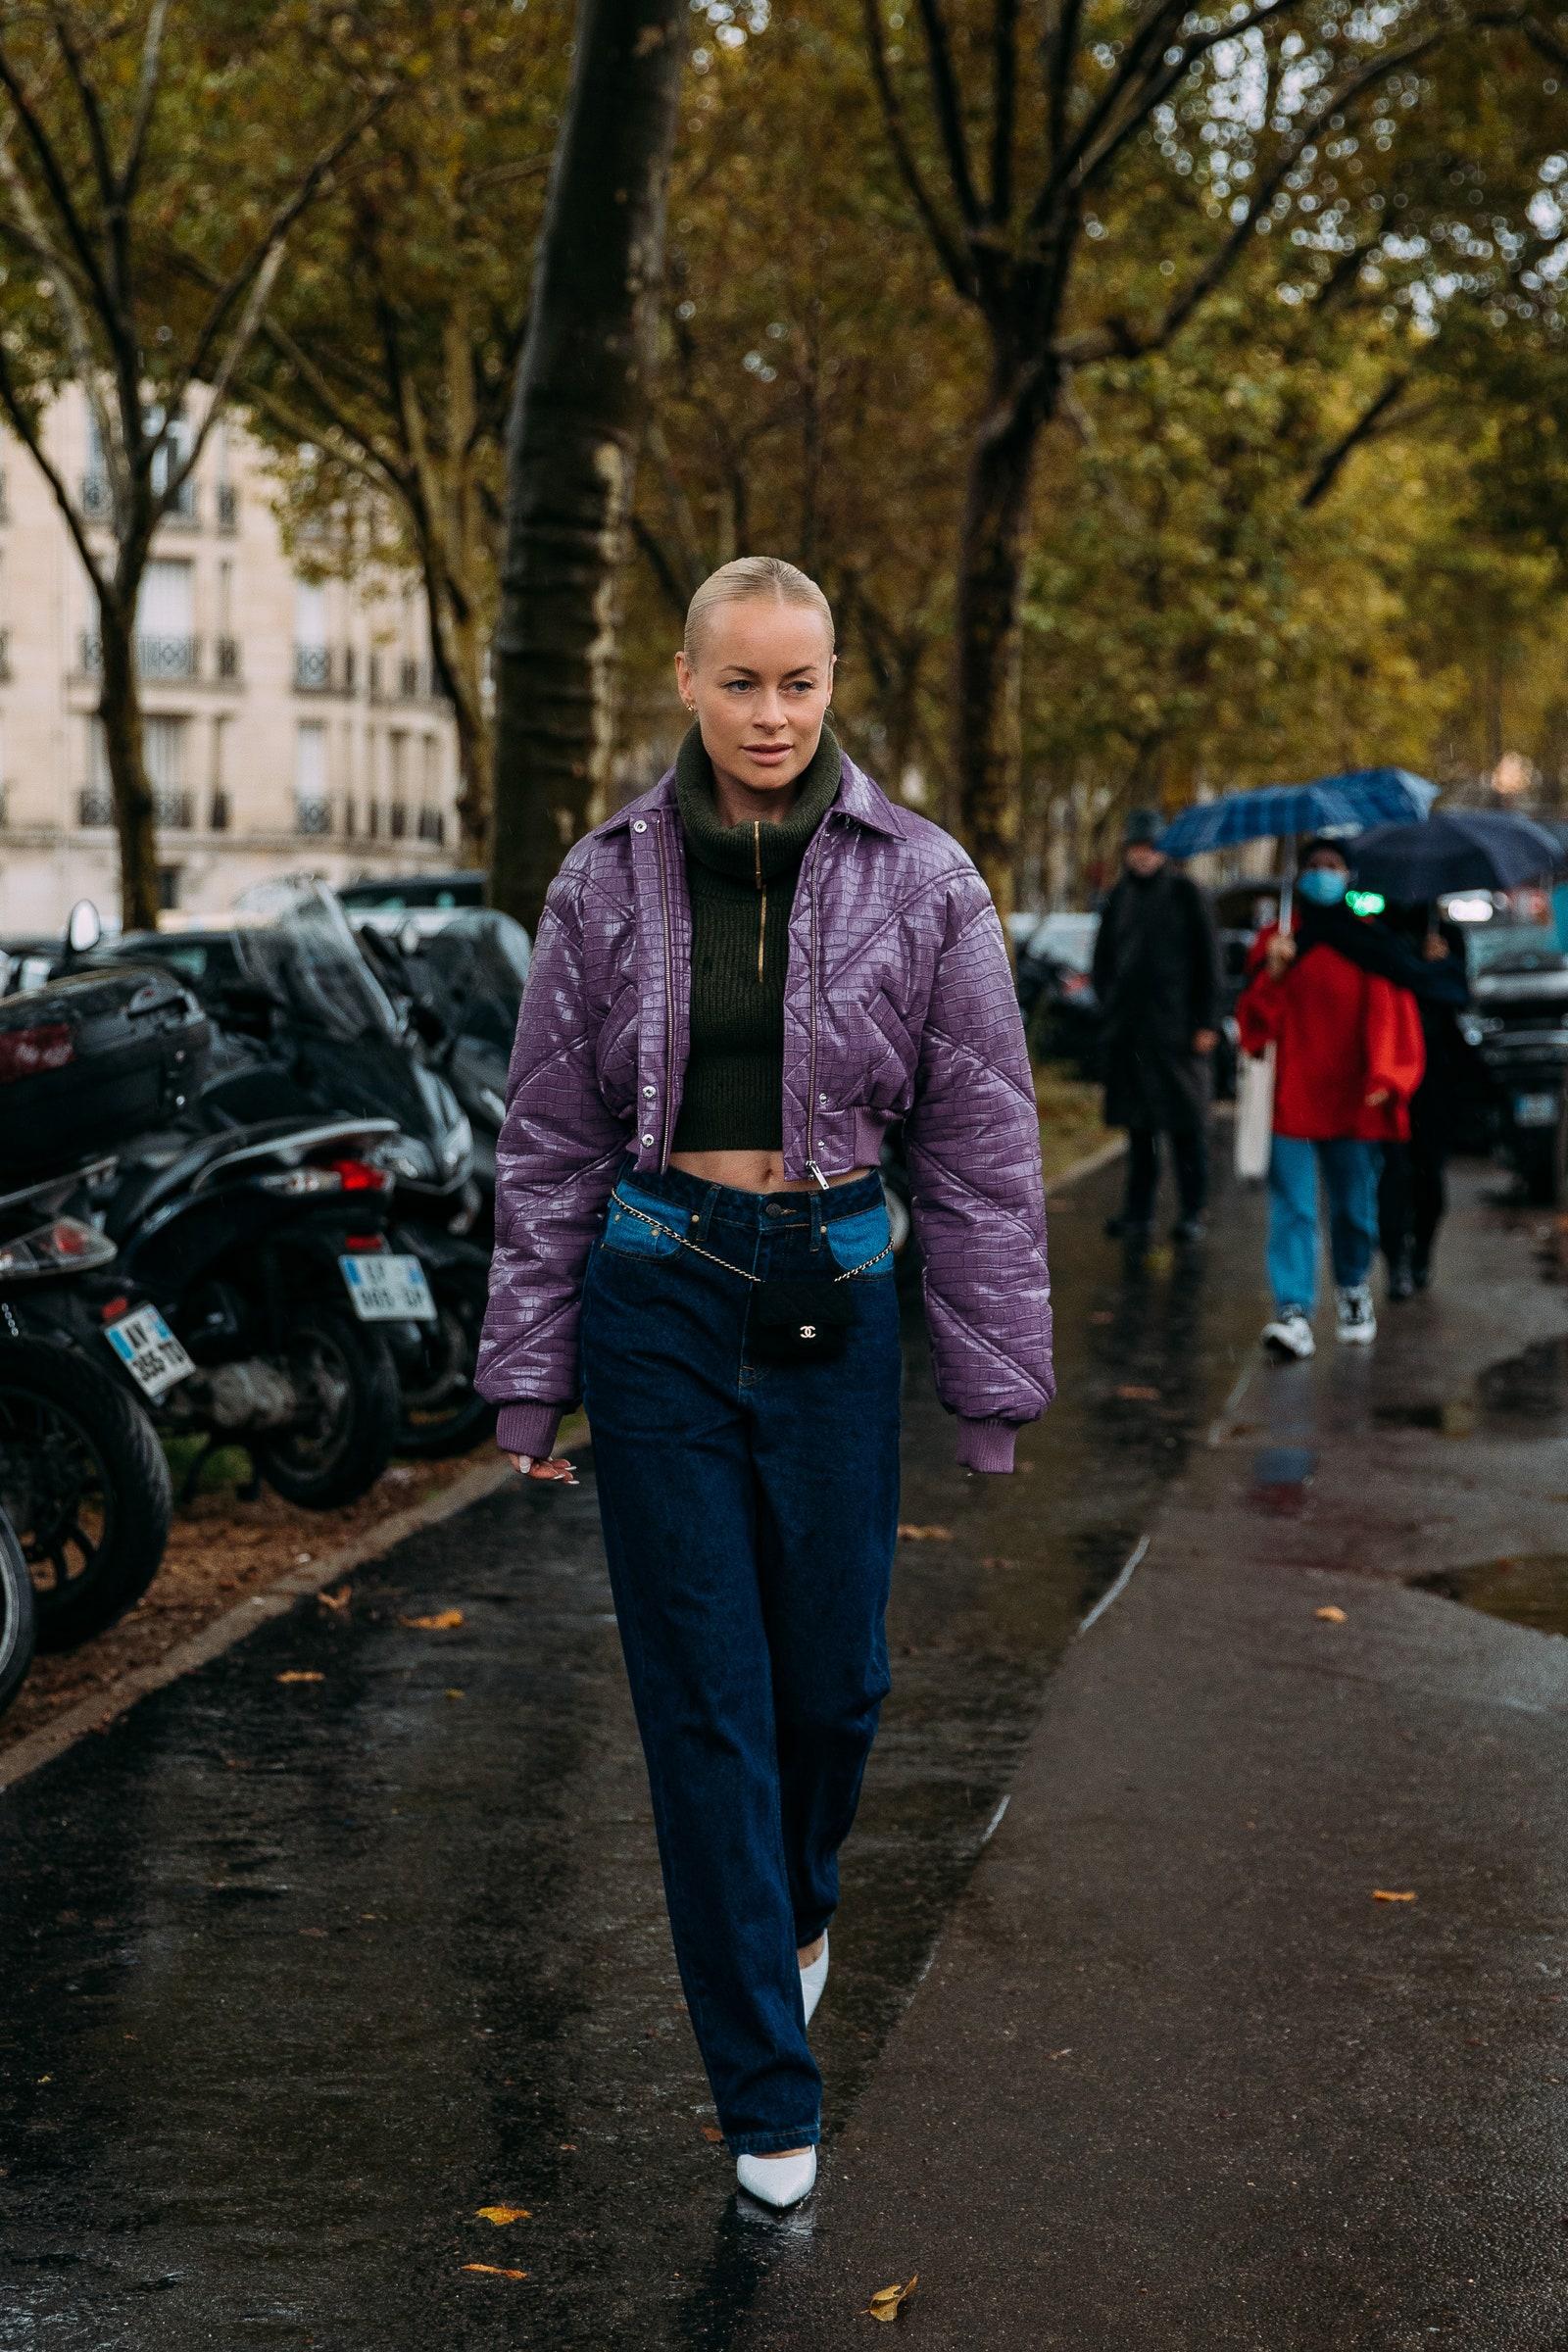 paris-street-style-11-16342229695341904690956.jpeg